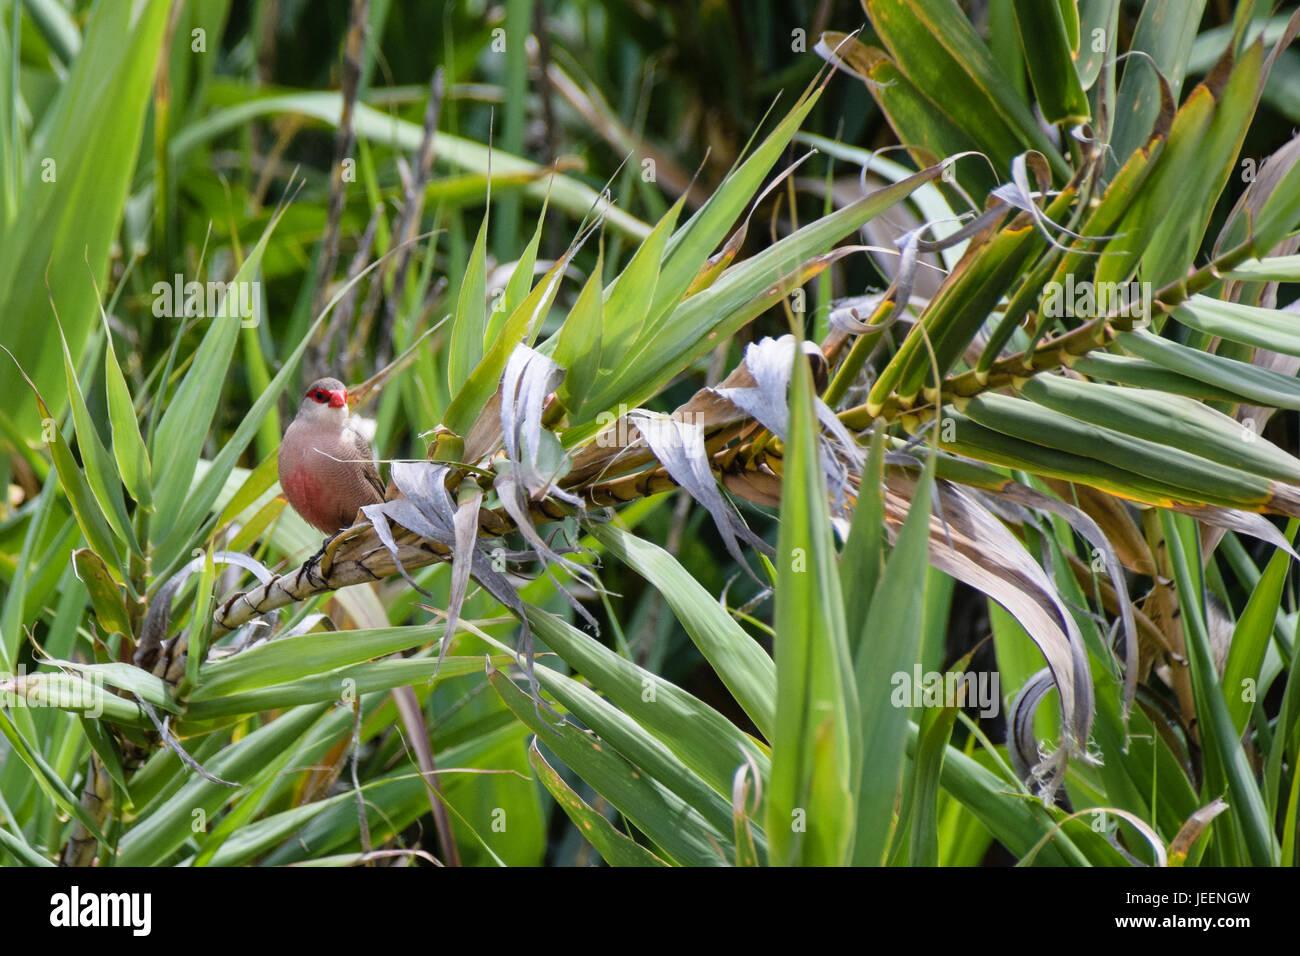 Common Waxbill wild bird amongst the vegetation in Porto Santo, Portugal - Stock Image